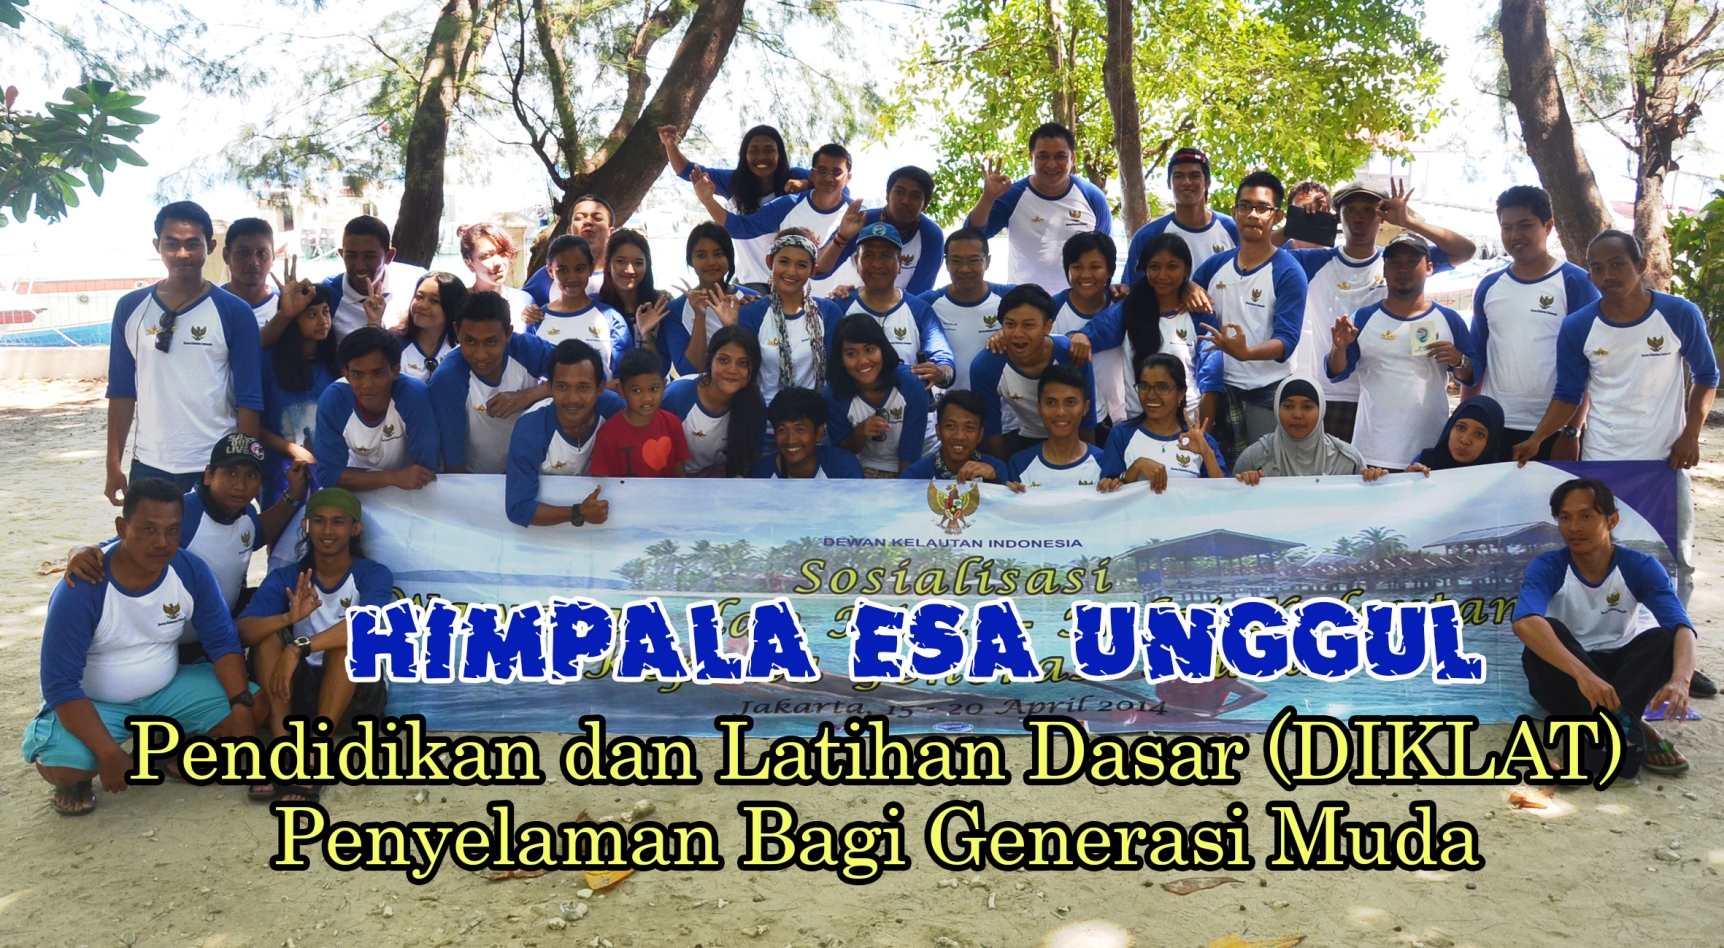 HIMPALA Universitas Esa Unggul mengikuti Pendidikan dan Latihan Dasar (DIKLAT) penyelaman bagi generasi muda yang diselenggarakan oleh Dewan Kelautan Indonesia